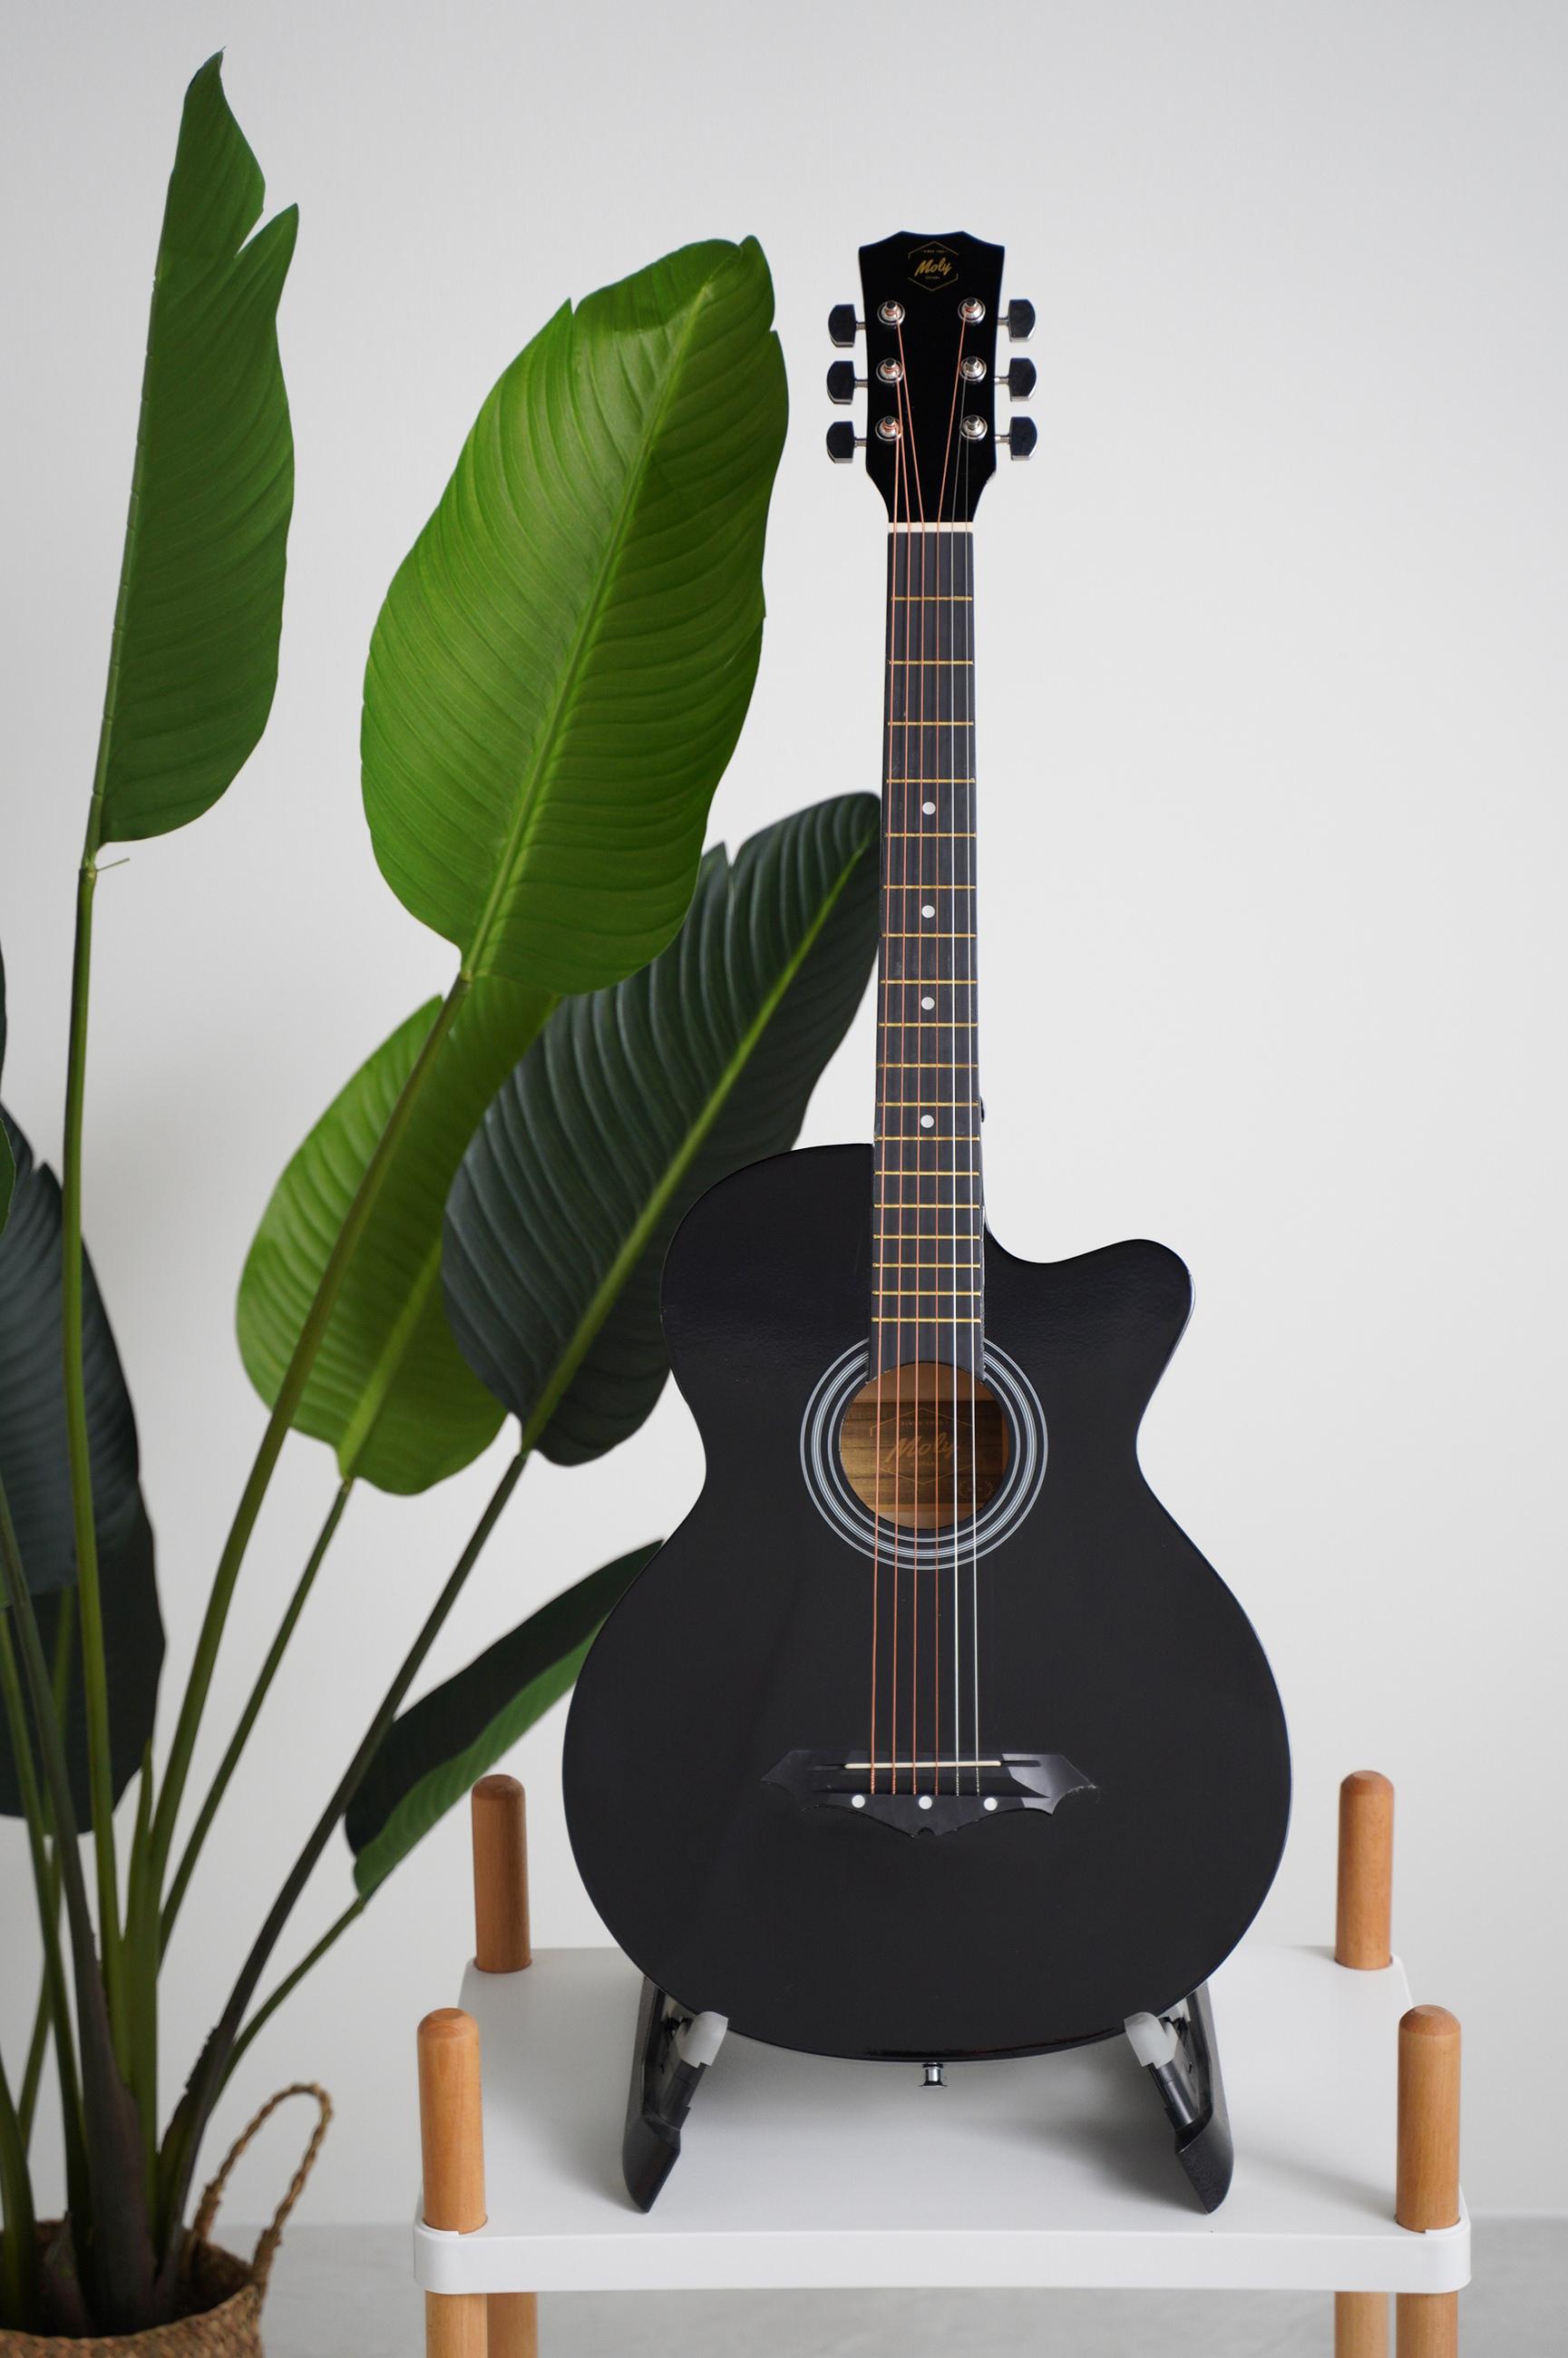 moly-ag-38-bk-acoustic-guitar-singapore-1.jpg